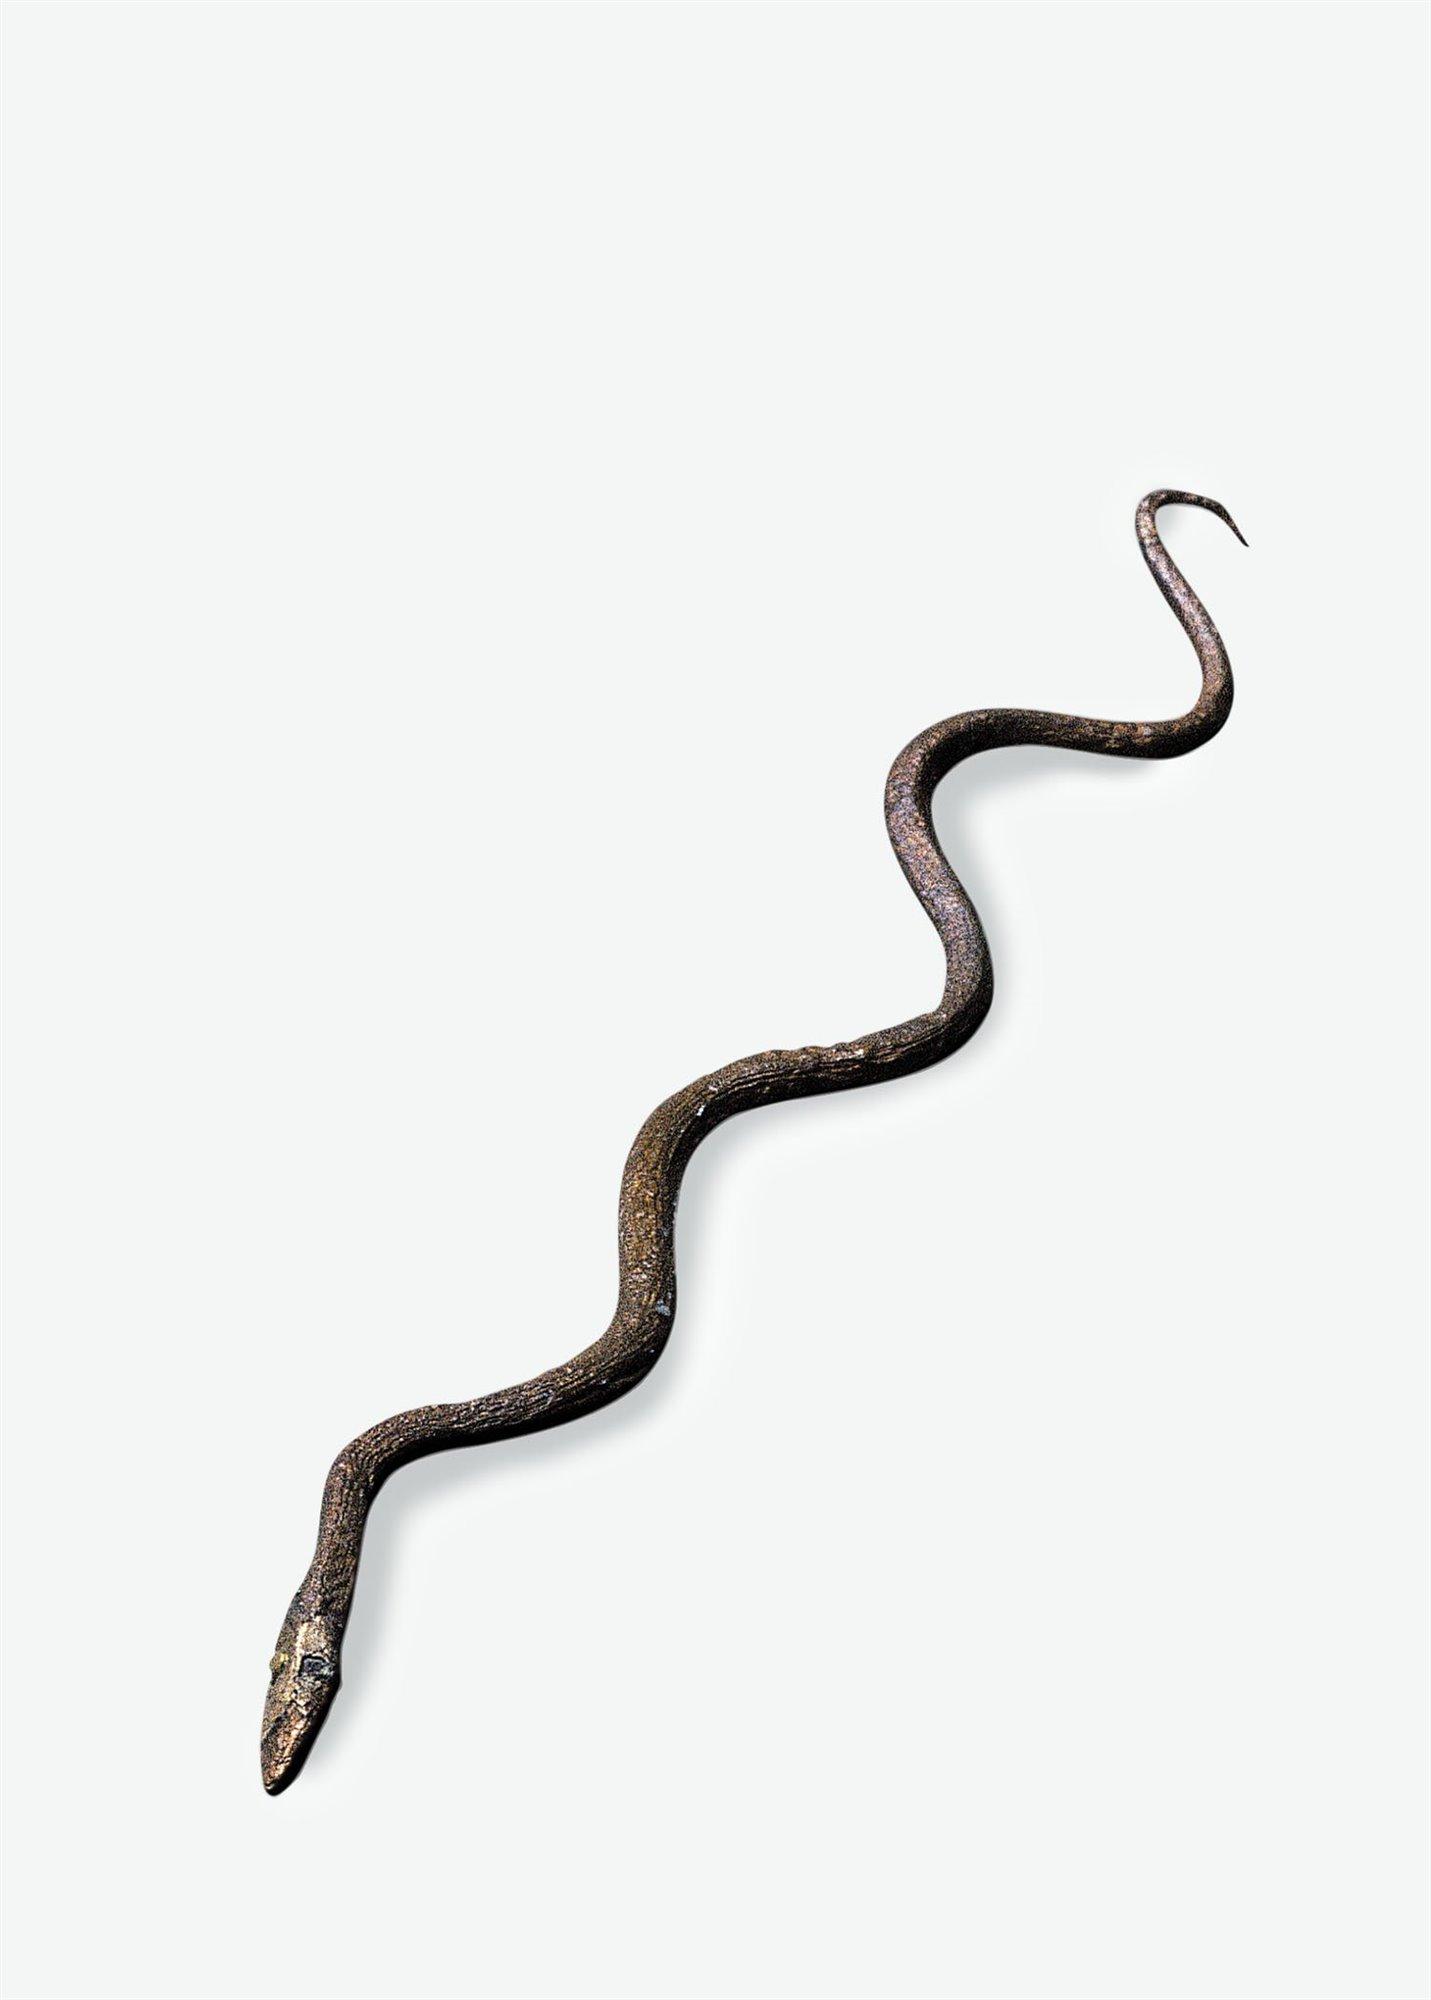 04 serpiente bronce animal amuleto sanador. Amuleto sanador